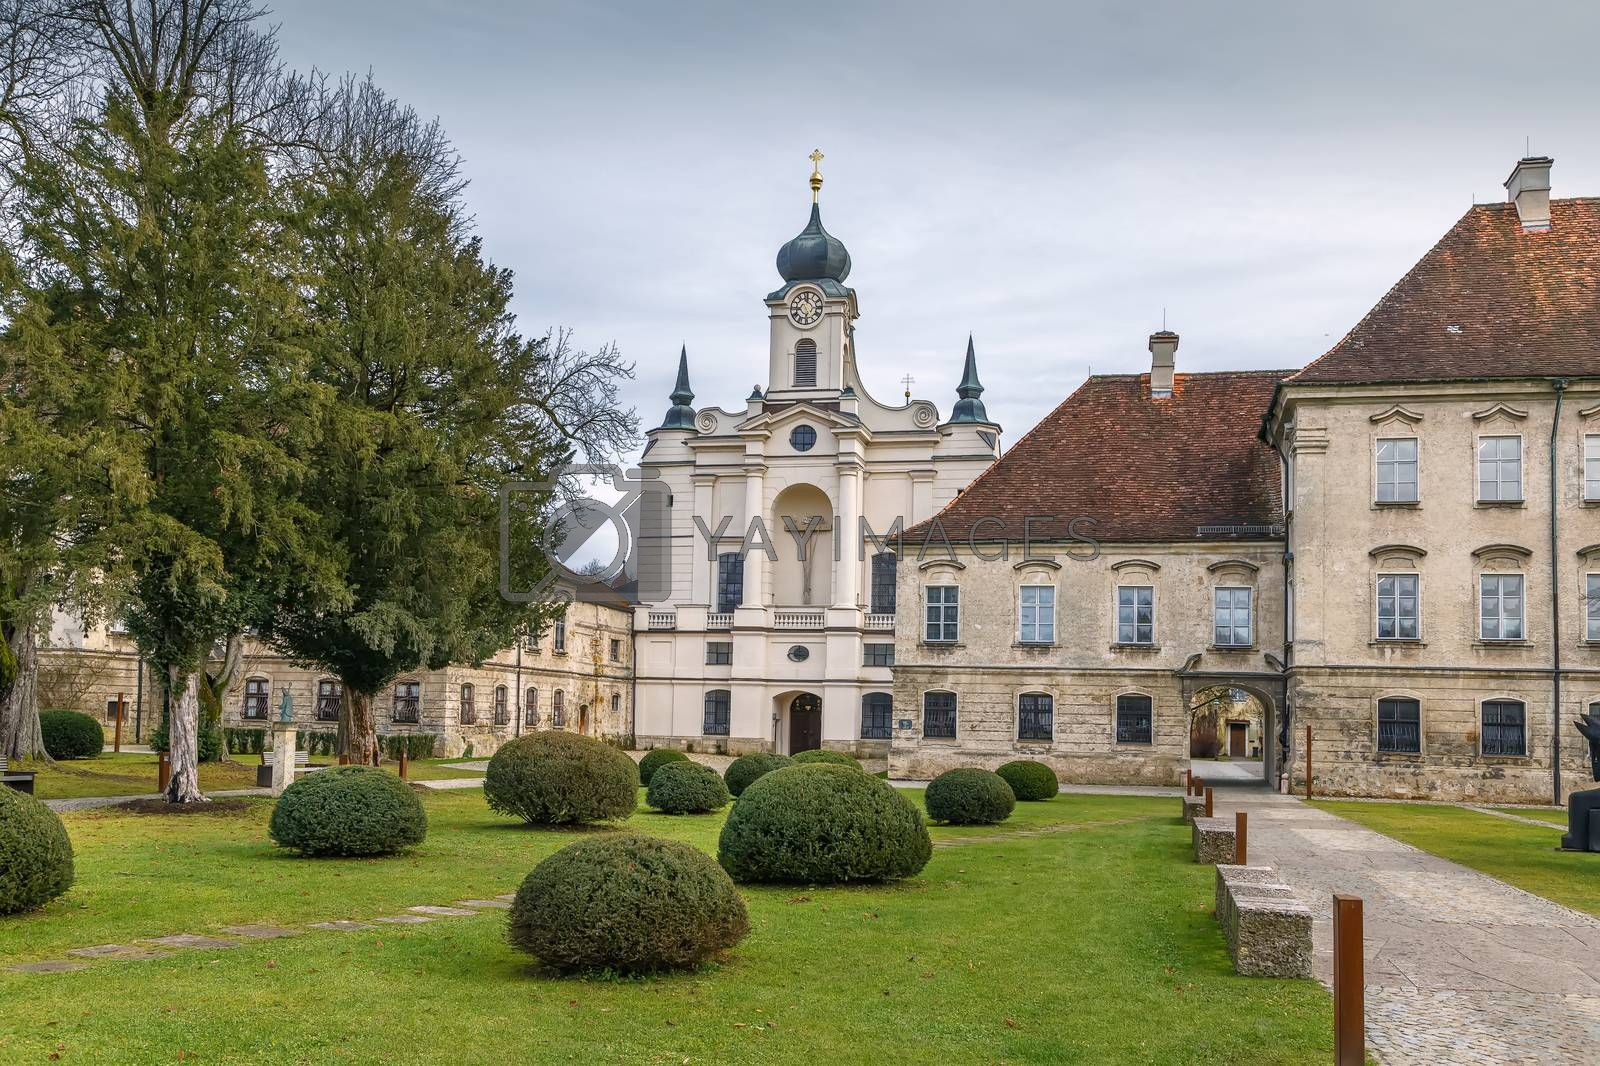 Church in Raitenhaslach abbey near Burghausen, Germany